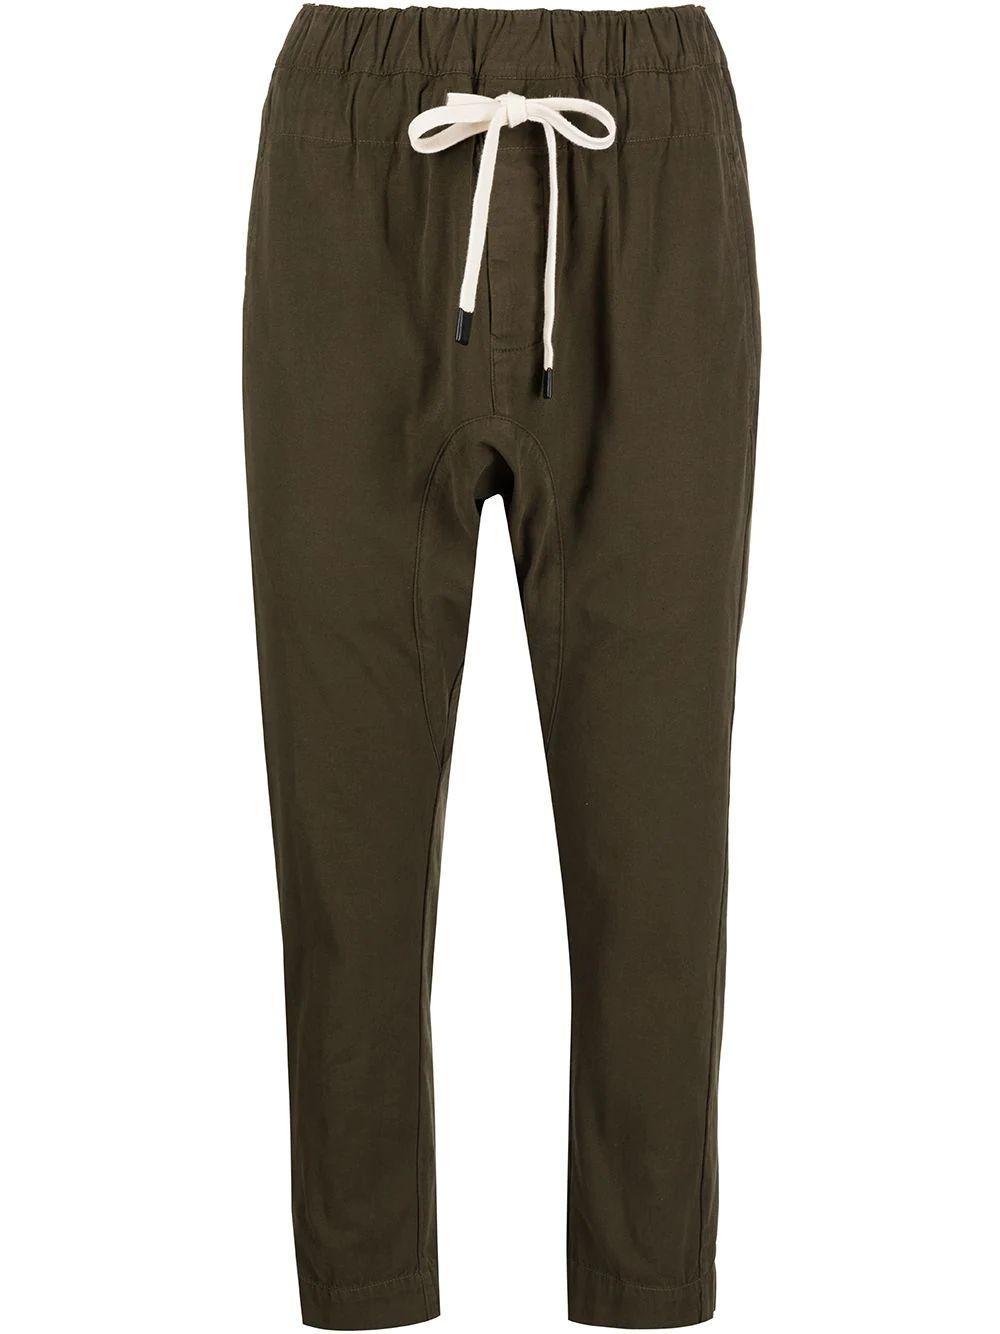 Original Cotton Drawstring Pant